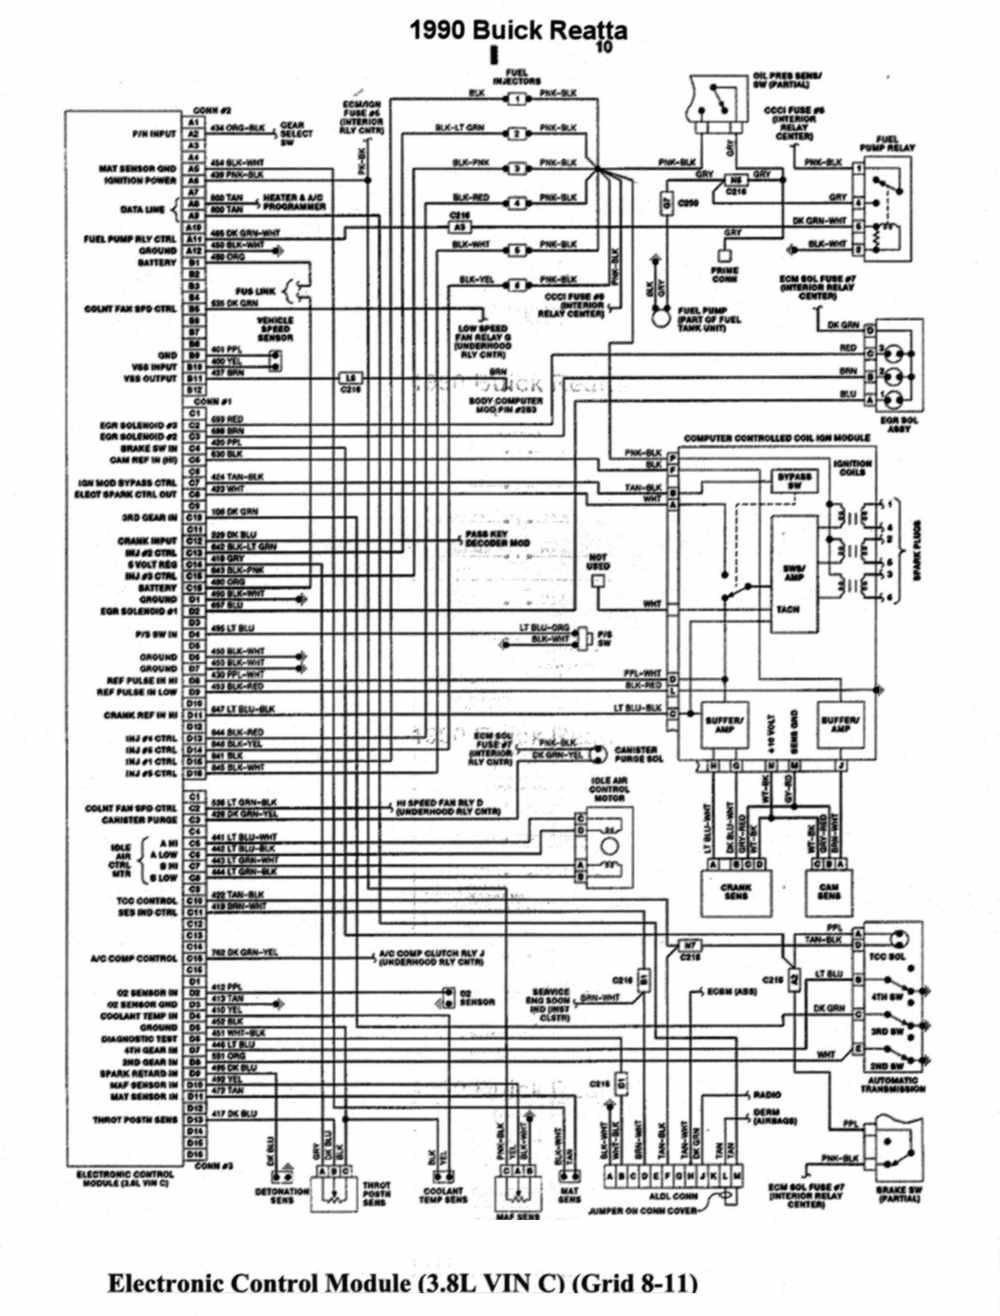 EO_3827] 2001 Buick Lesabre Car Stereo Wiring Diagram Download DiagramUltr Exmet Viewor Kweca Hendil Ponge Skat Peted Phae Mohammedshrine Librar  Wiring 101